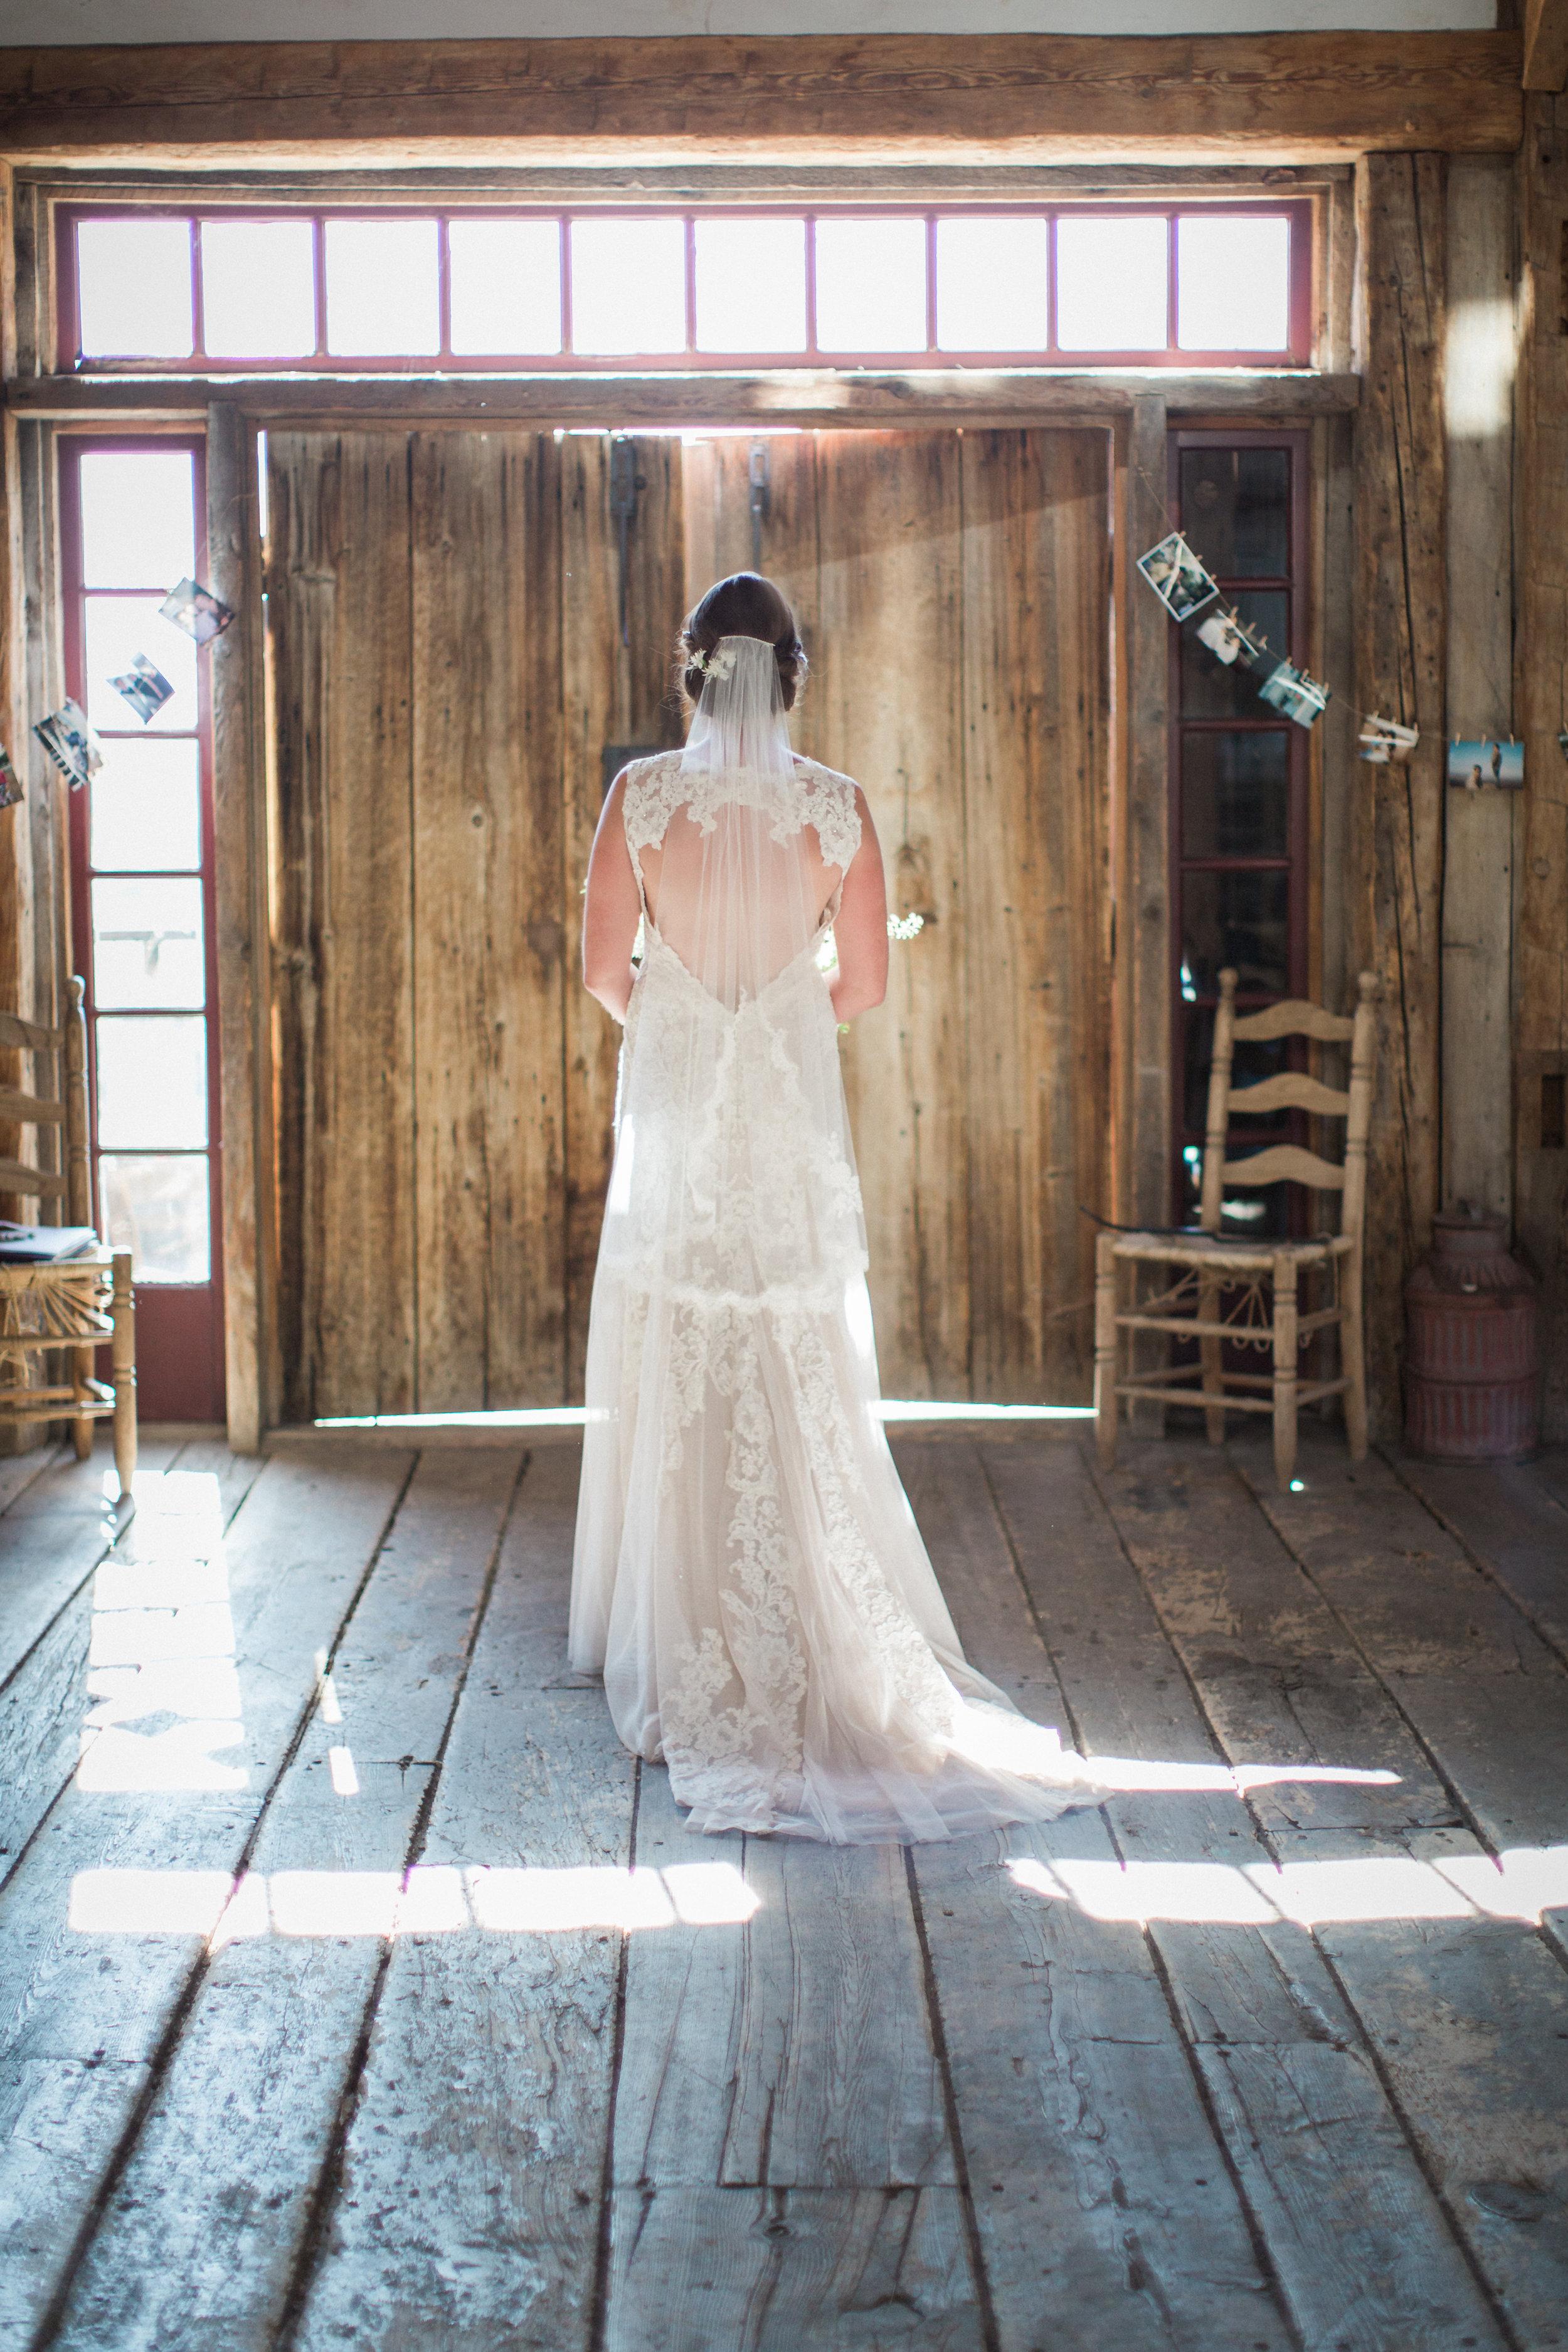 www.santabarbarawedding.com | Kiel Rucker Photography | Joelle Charming Wedding Planner | Figueroa Mountain Farmhouse | Ella & Louie Flowers | Wedding Dress